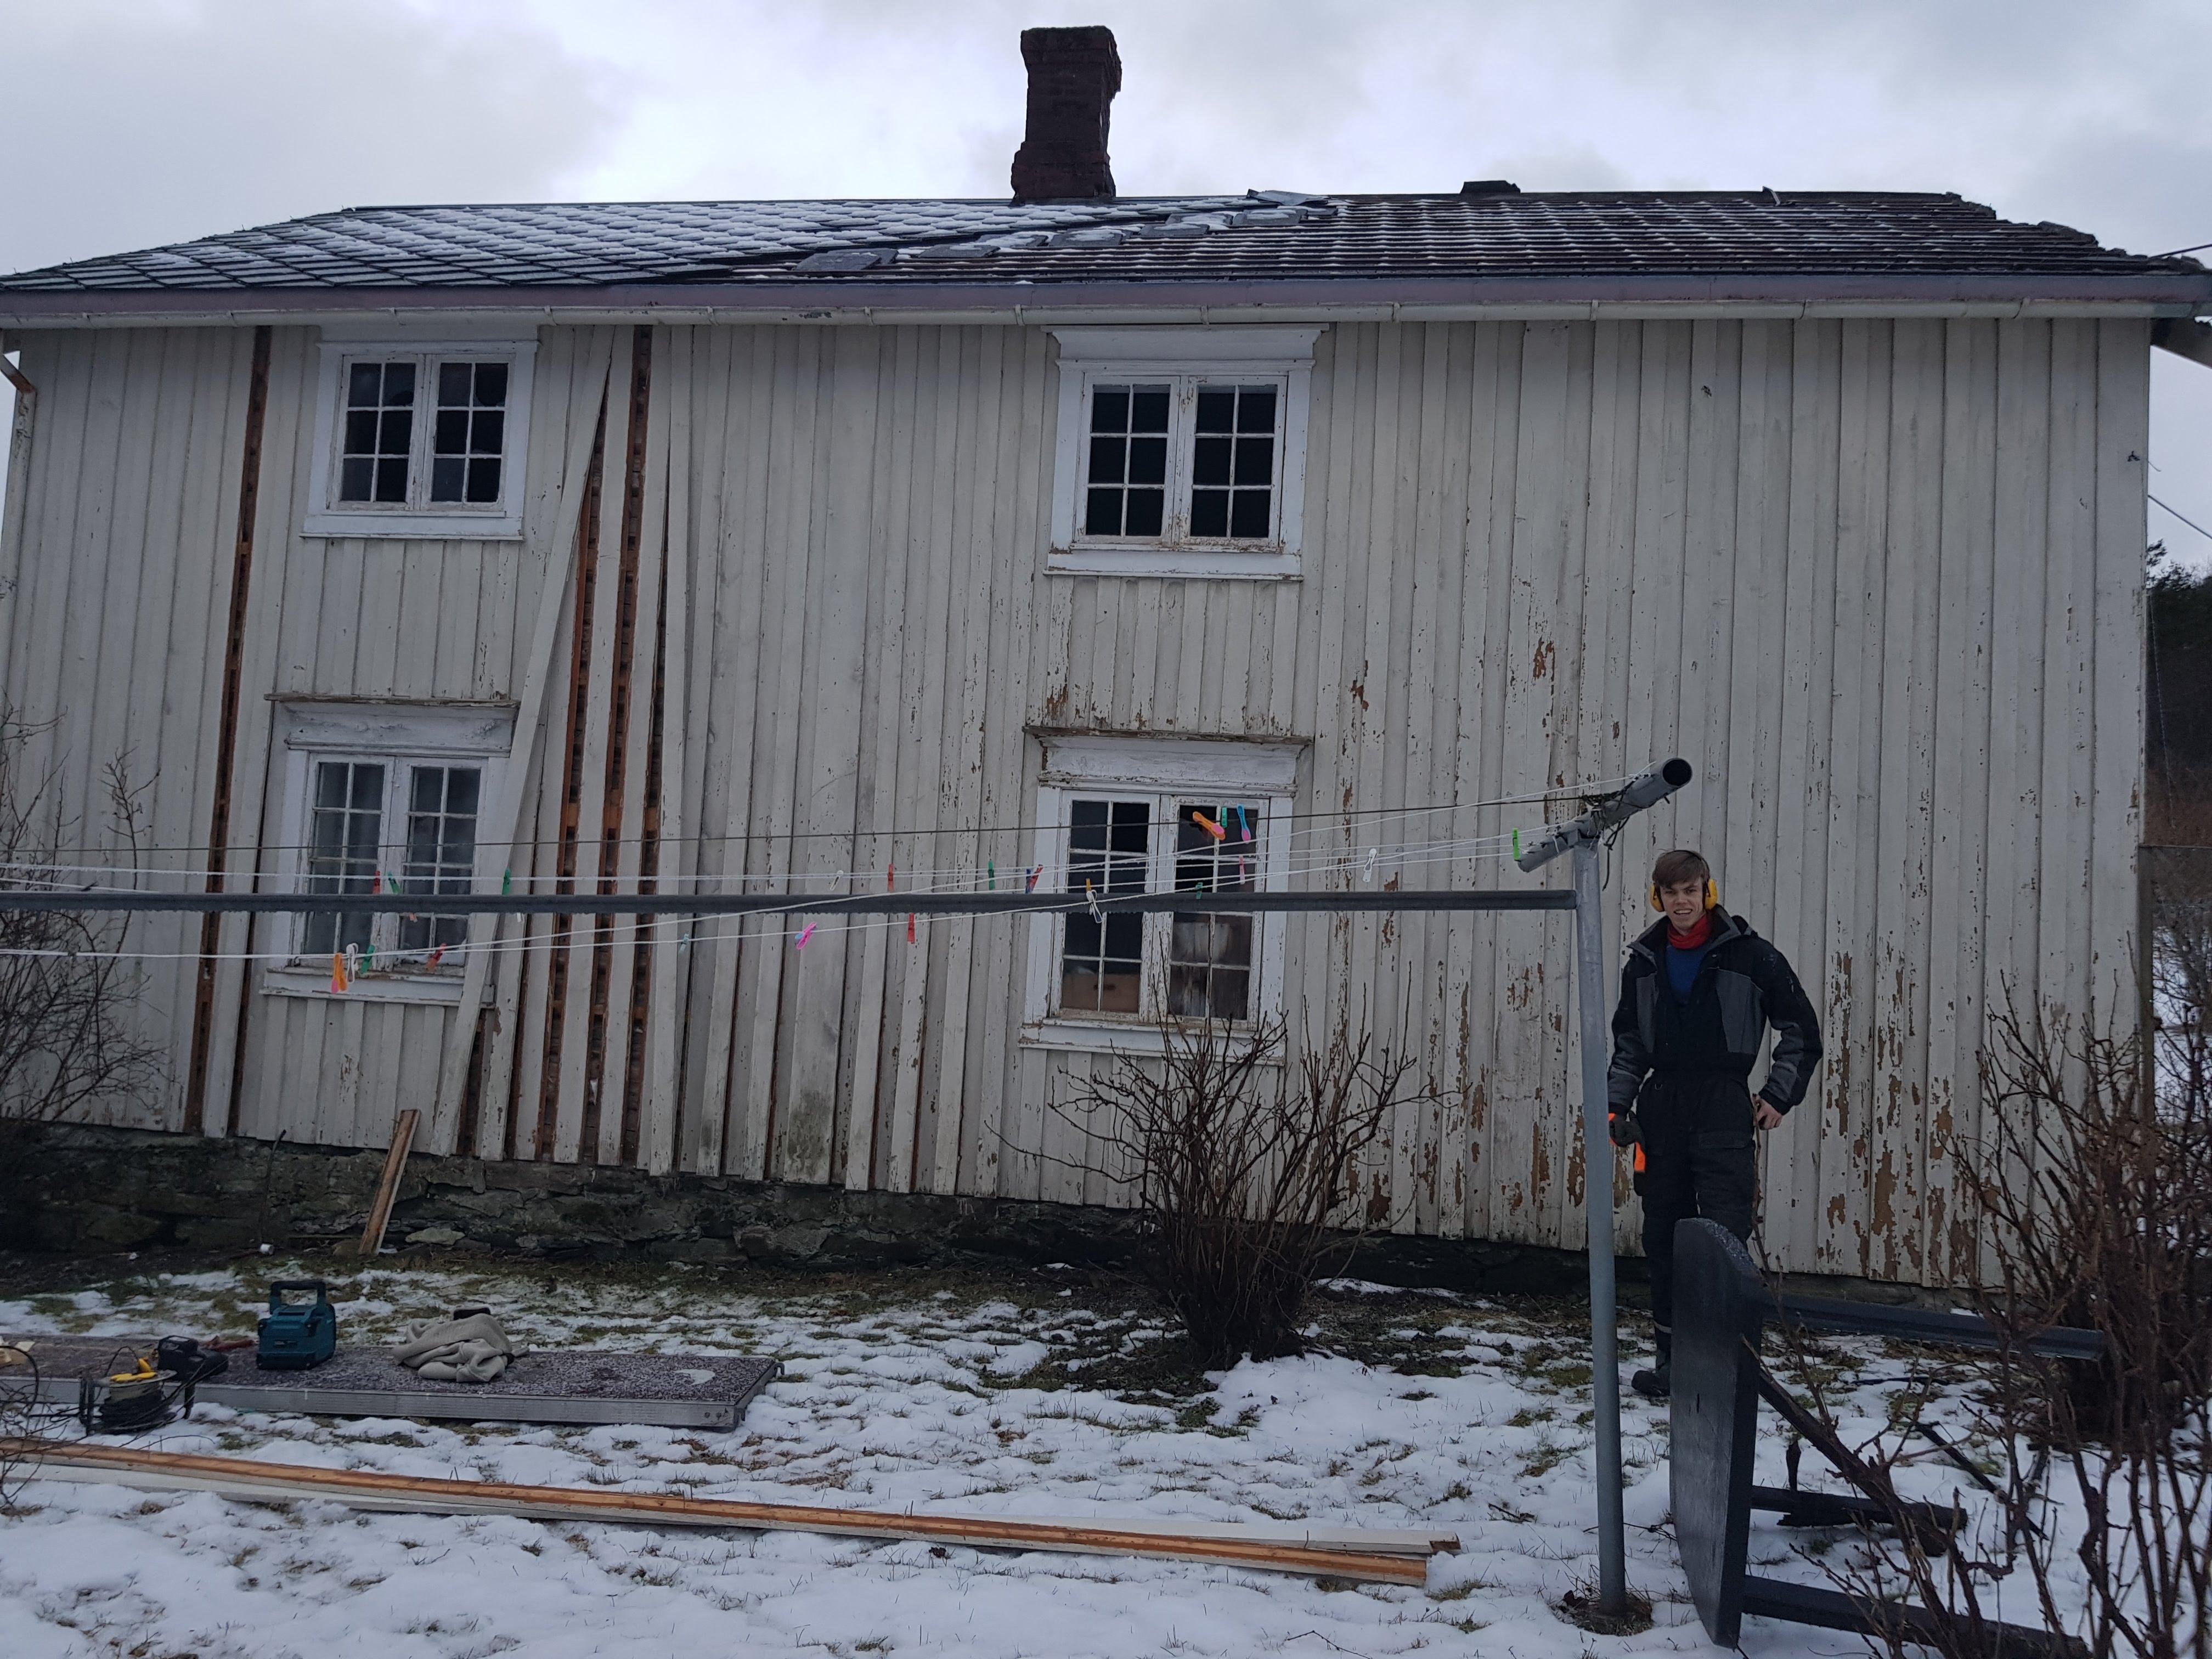 Emil på familiegården til Ola Ravn i Hasselvika.